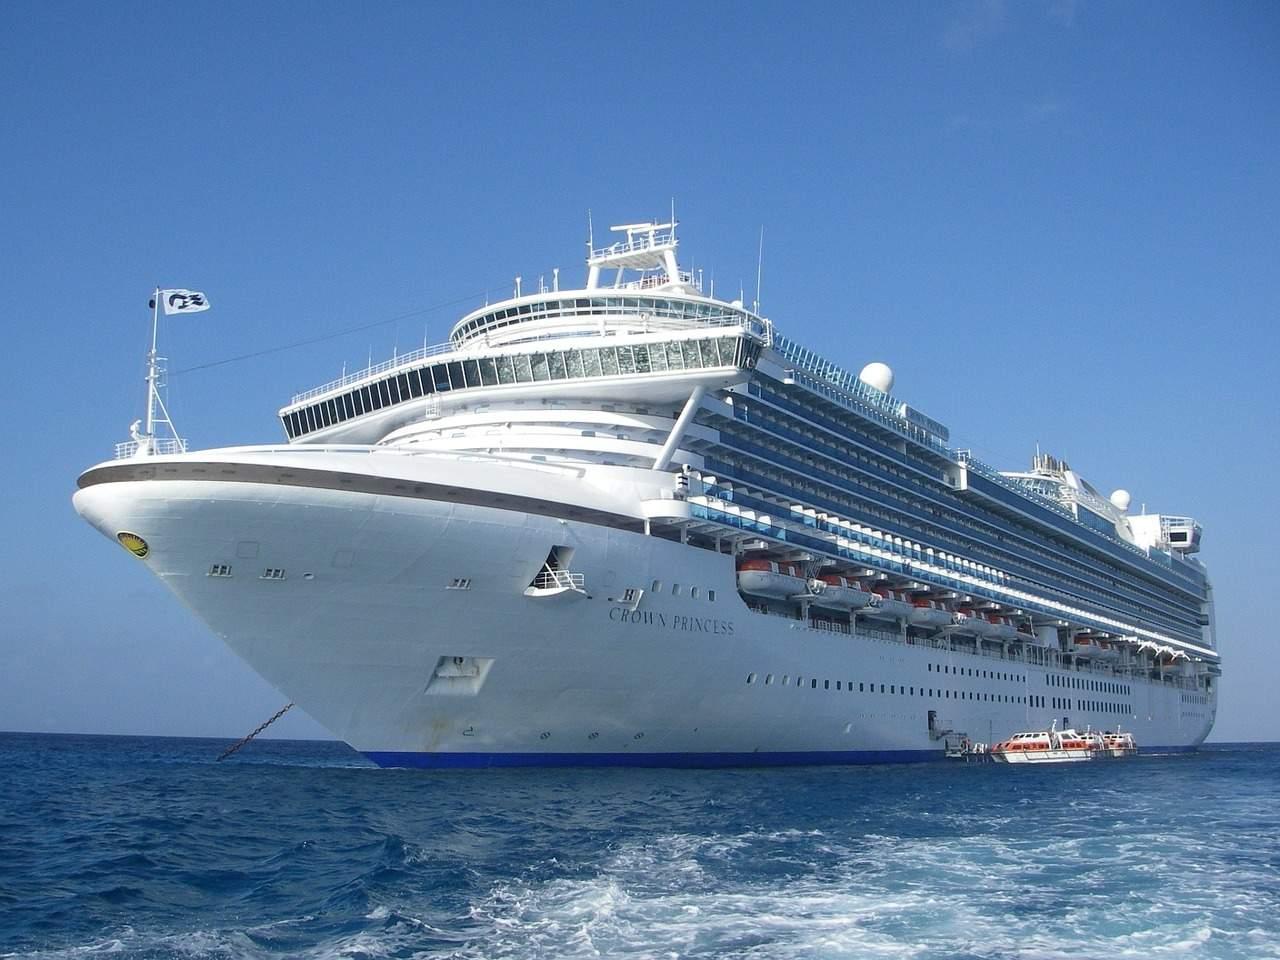 Book here worldwide Sea Cruise